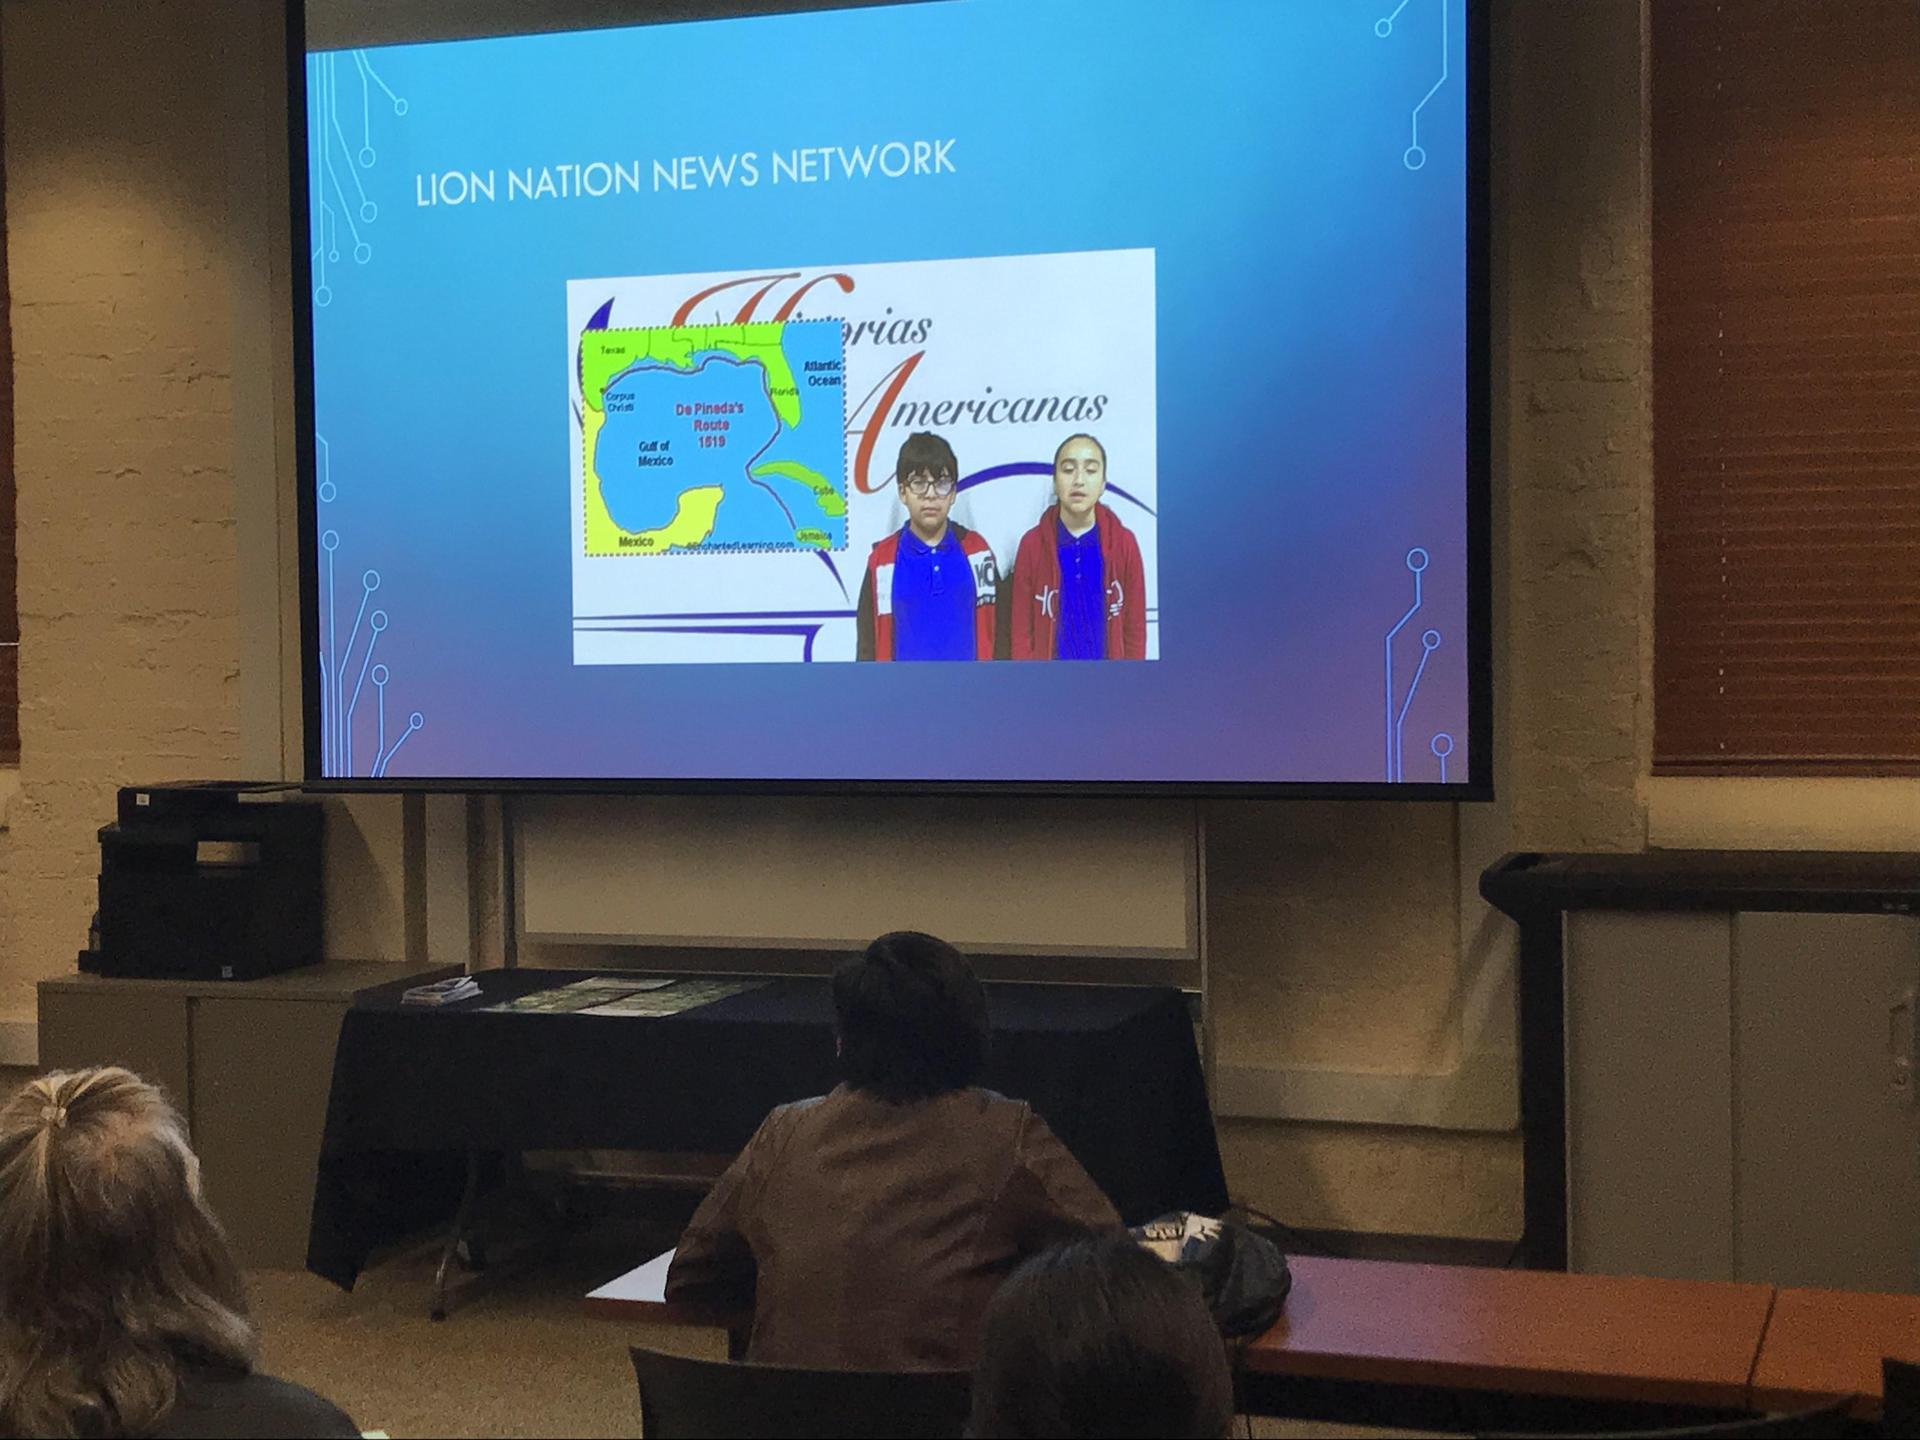 Presentation on Screen